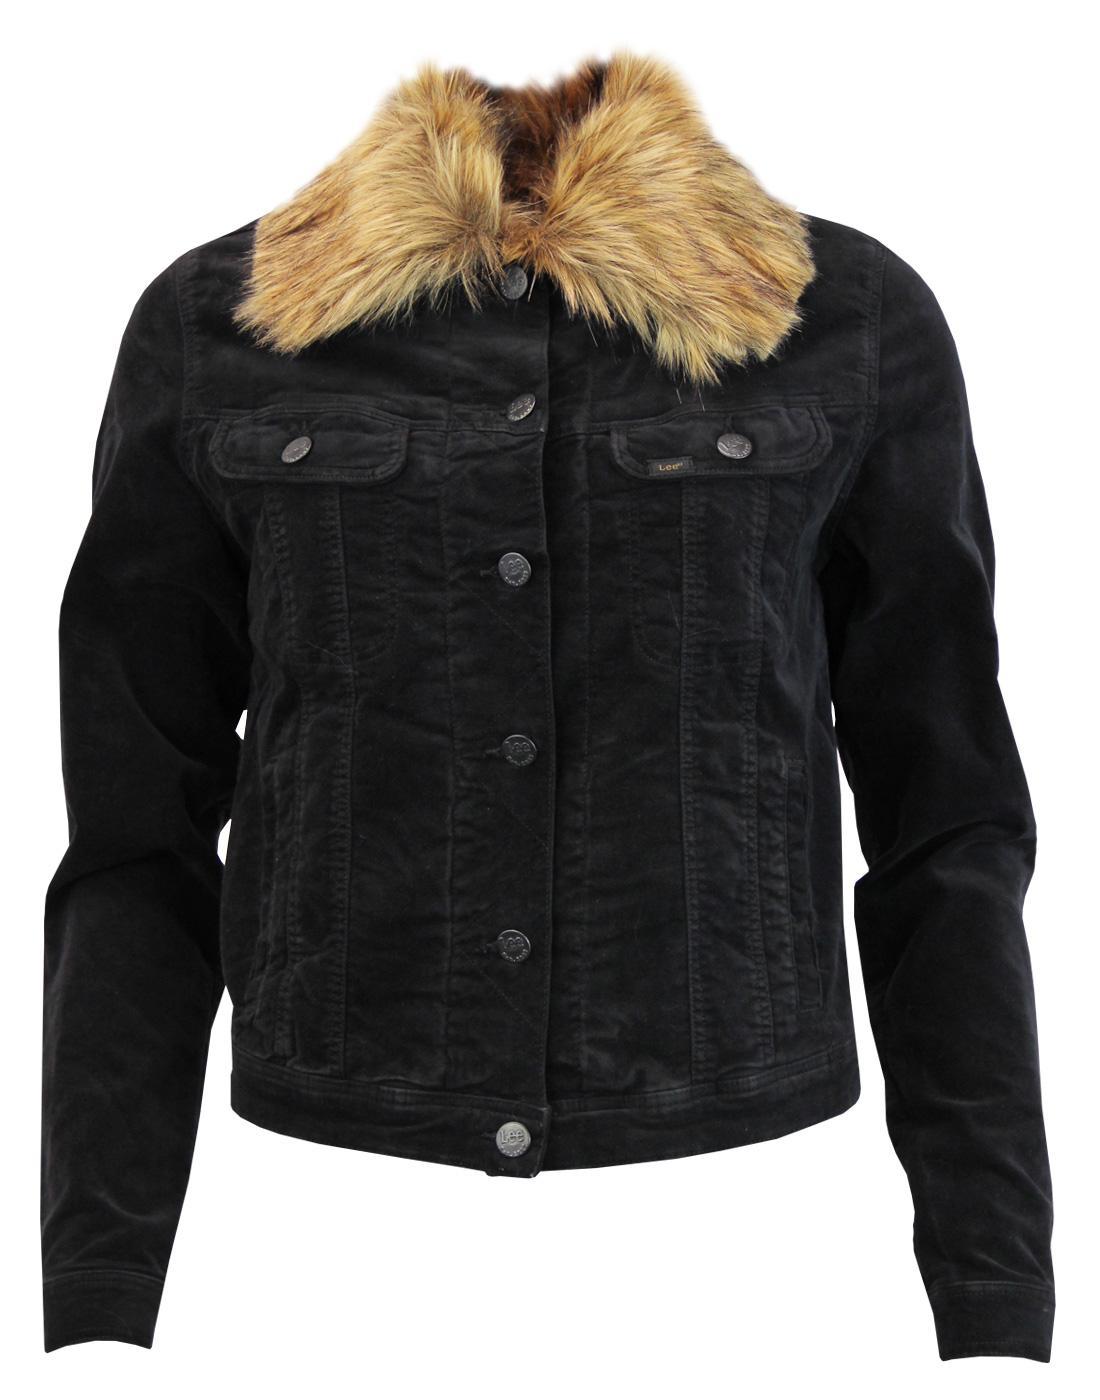 LEE Women's Faux Fur Collar Velvet Rider Jacket